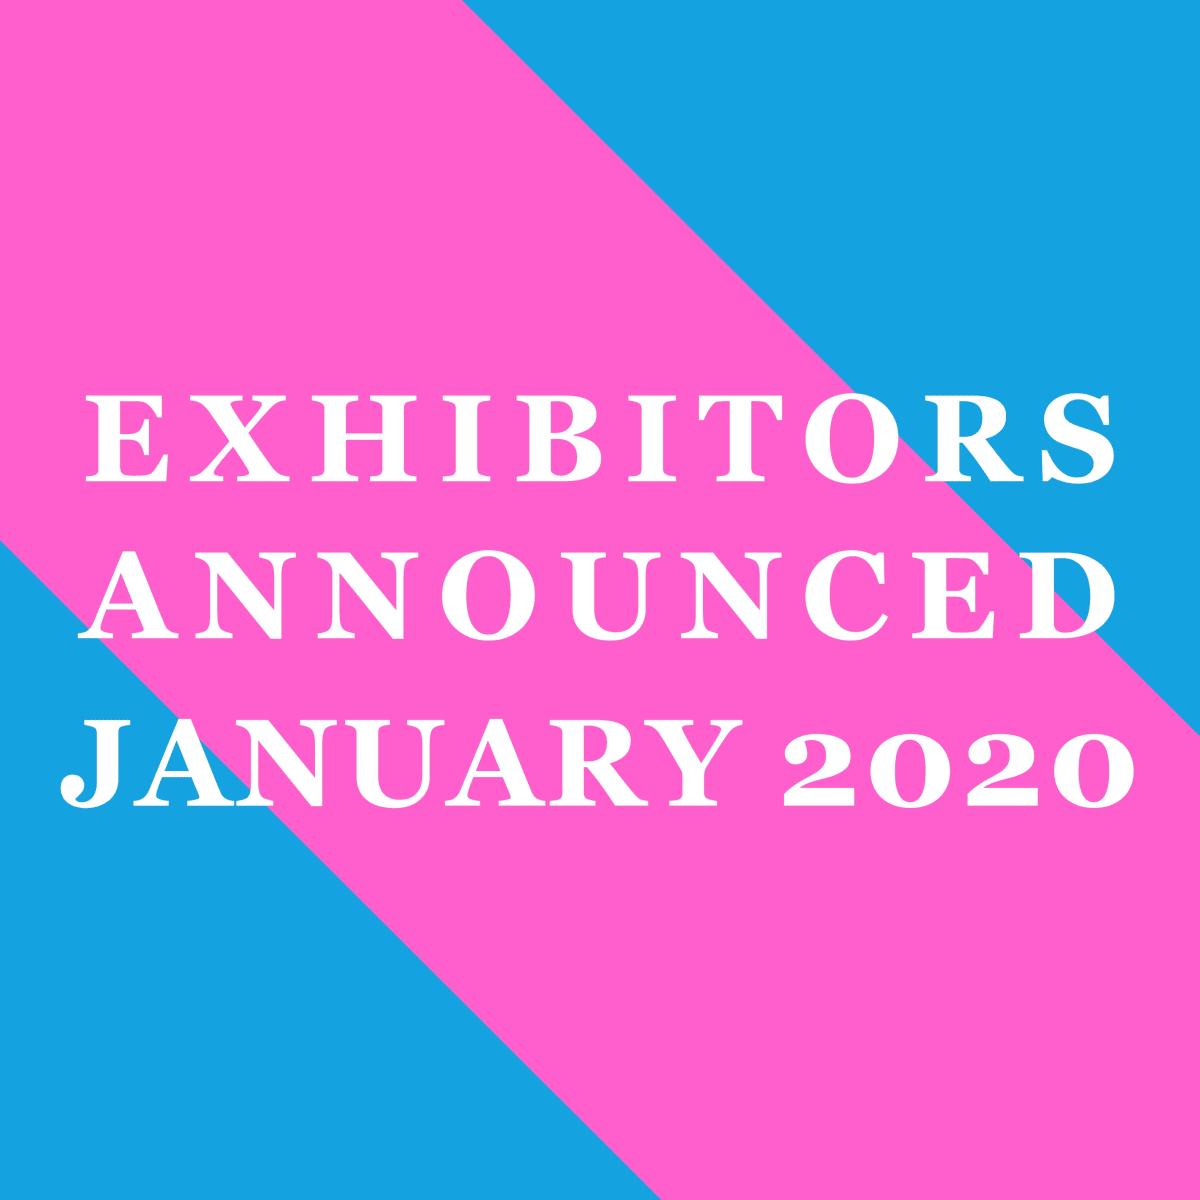 LOPF 2020 Exhibitors, Announced January 2020